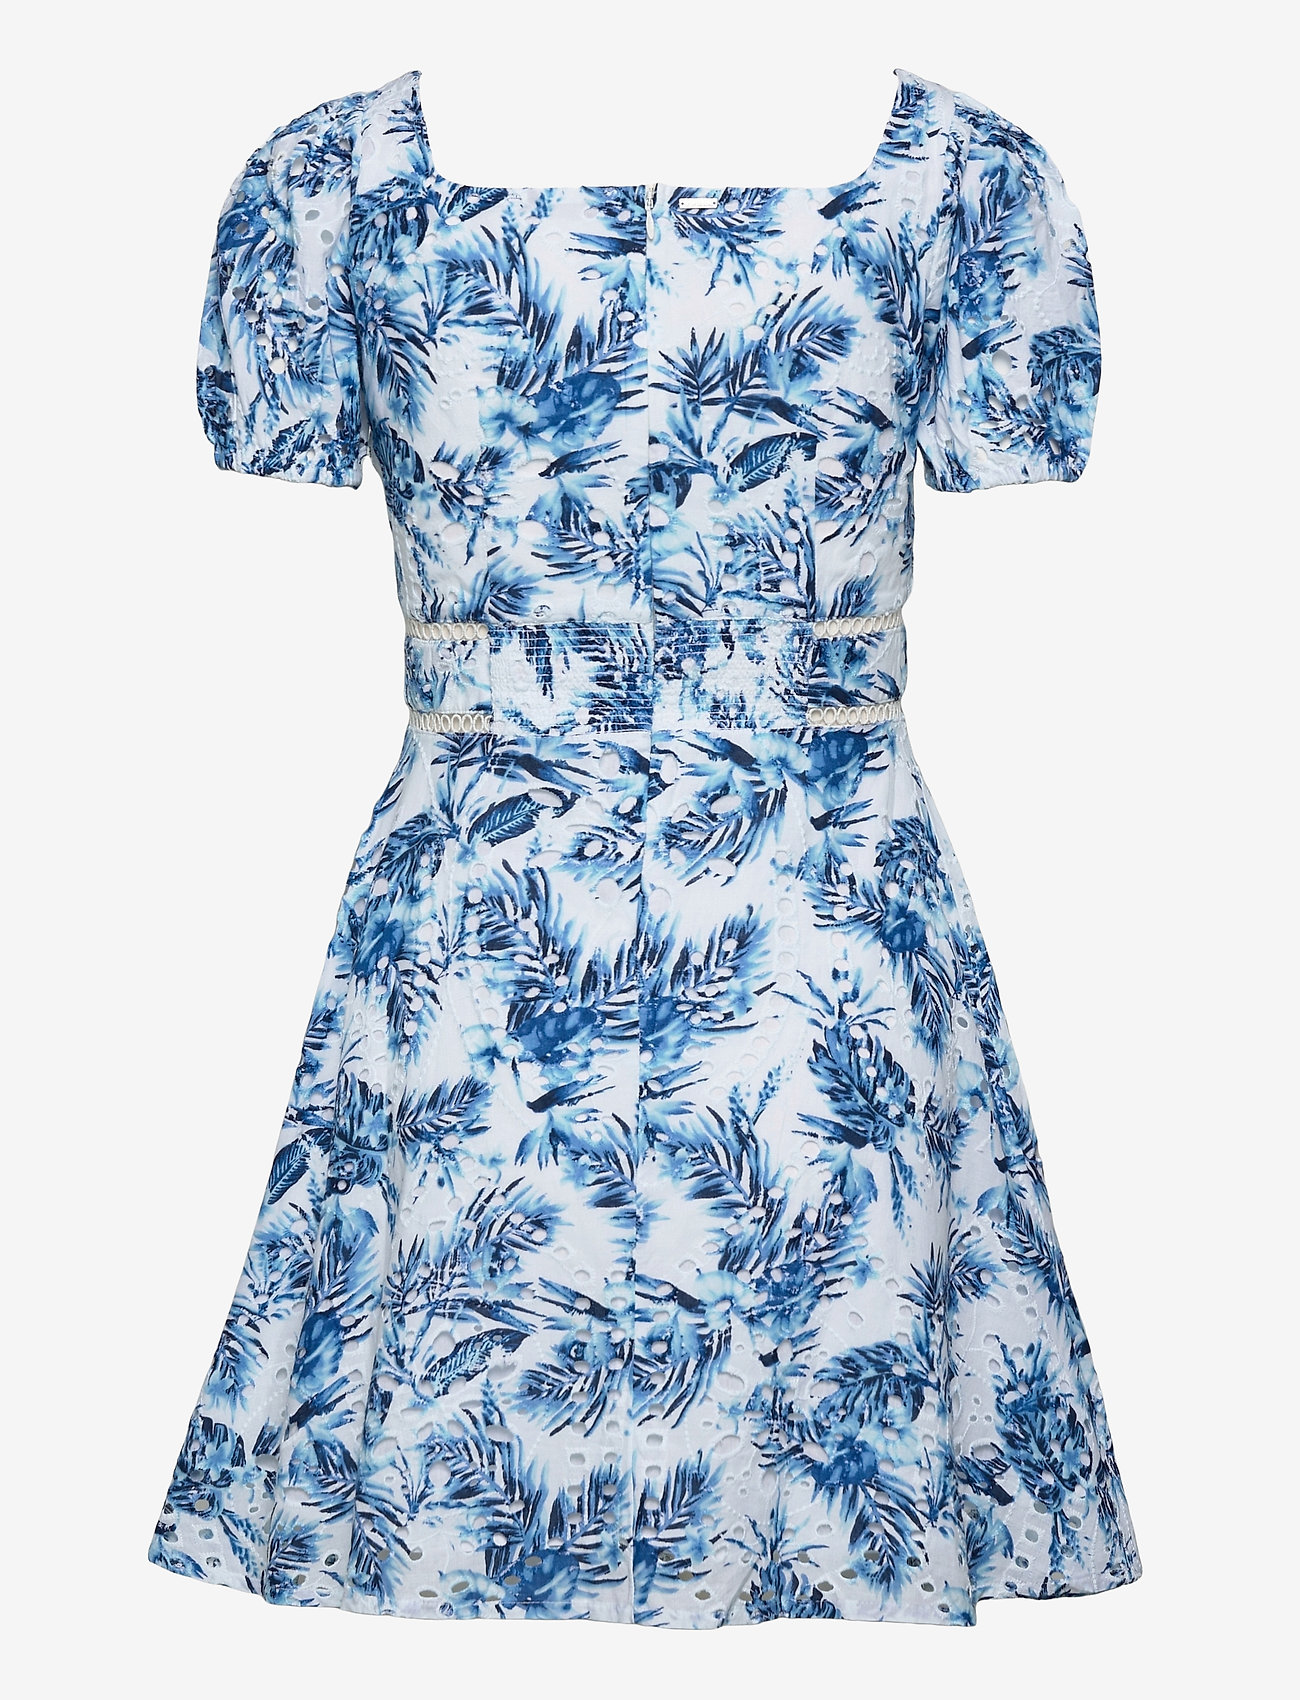 GUESS Jeans - ROBIN DRESS - robes d'été - anthurium blue fl - 1